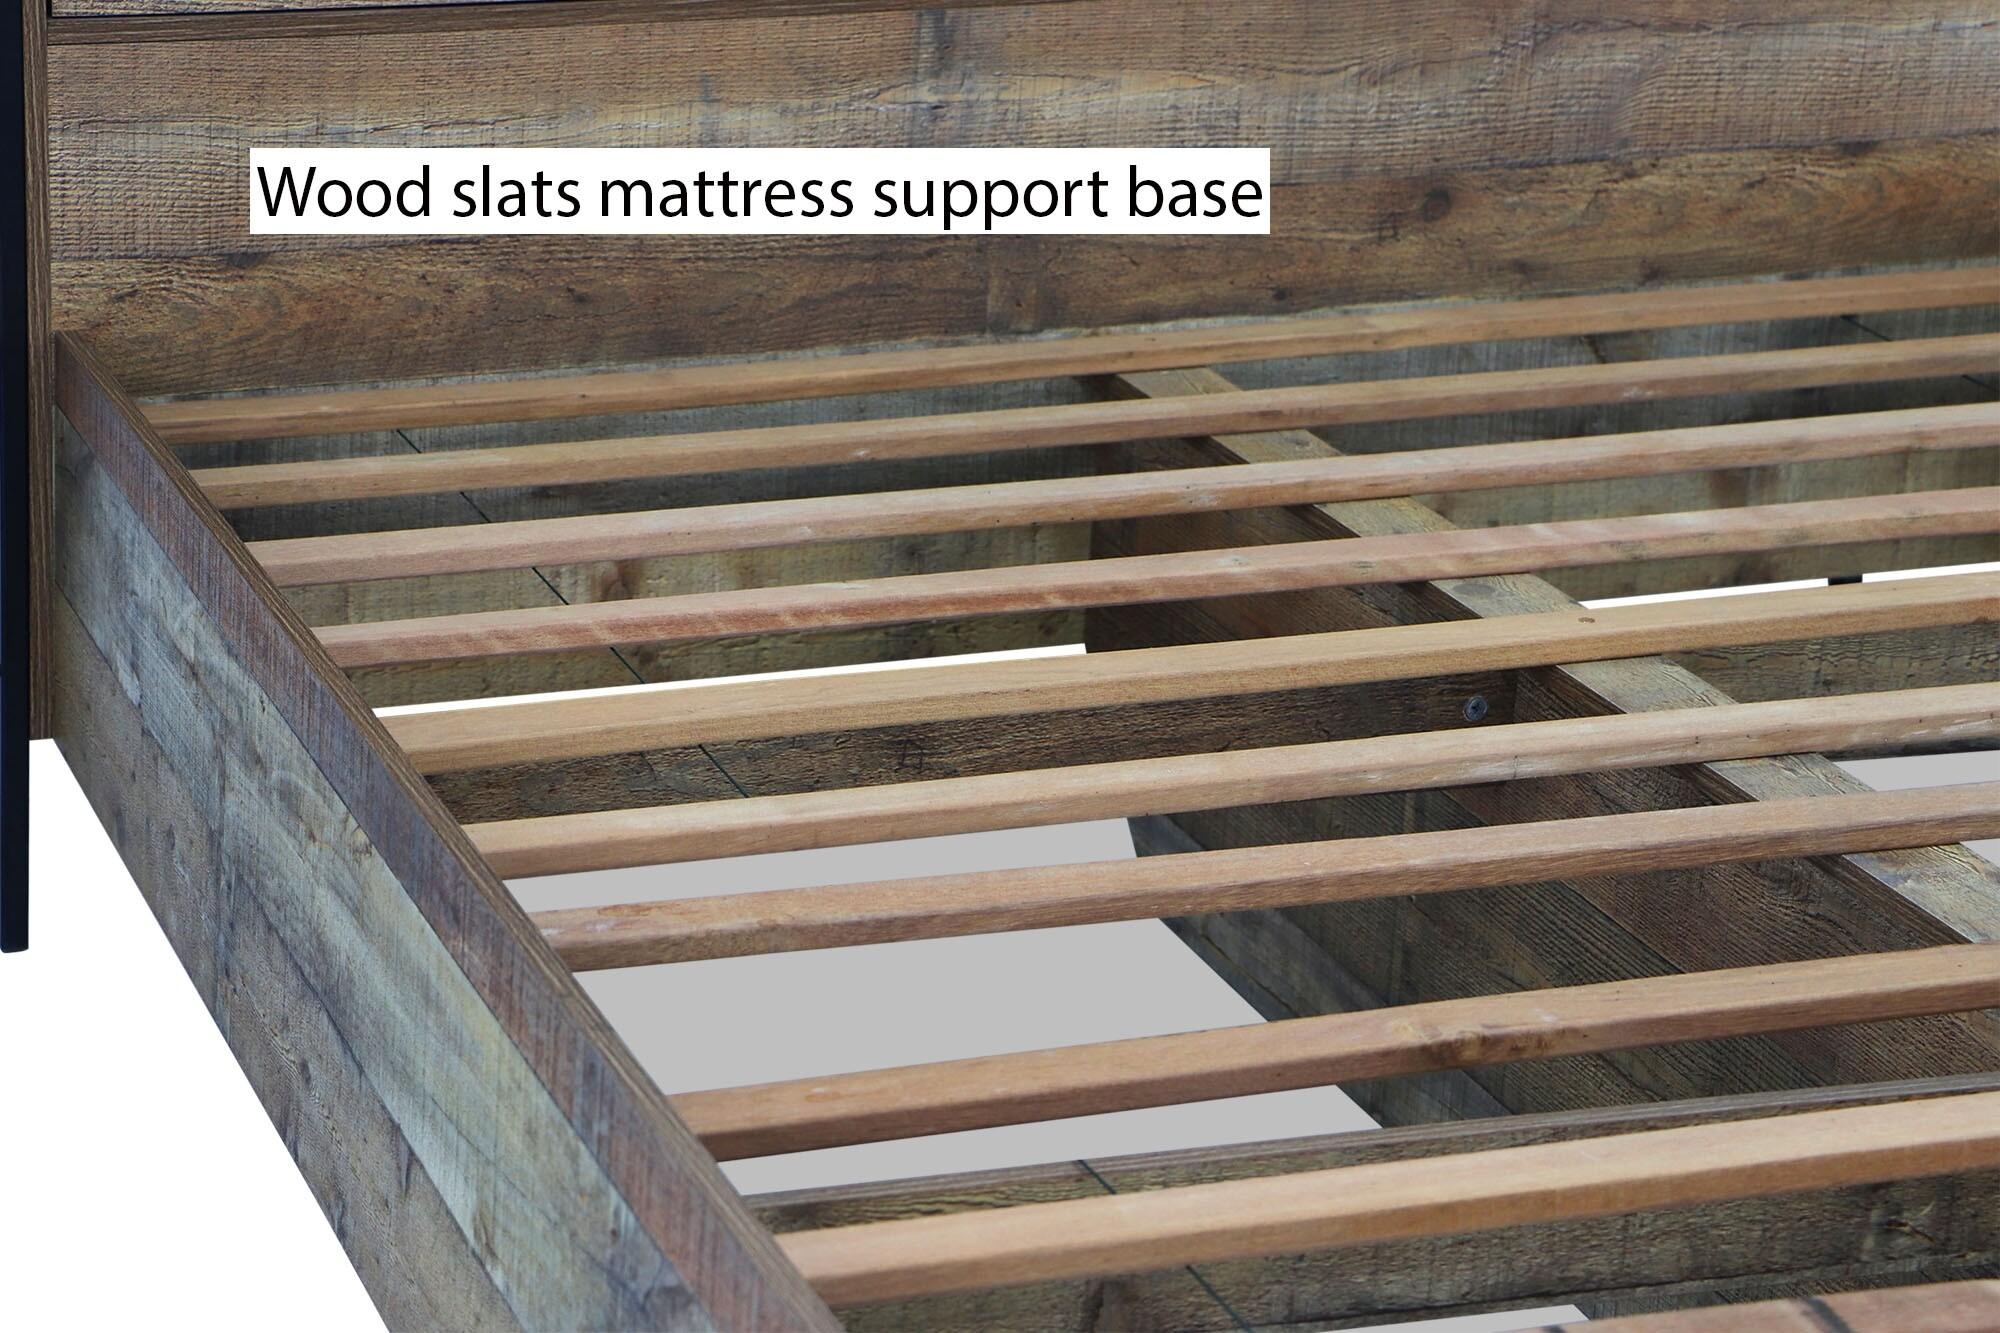 frame platform steel platformsteelbedlowprofile moreview floor bed low boltz lightbox furniture profile